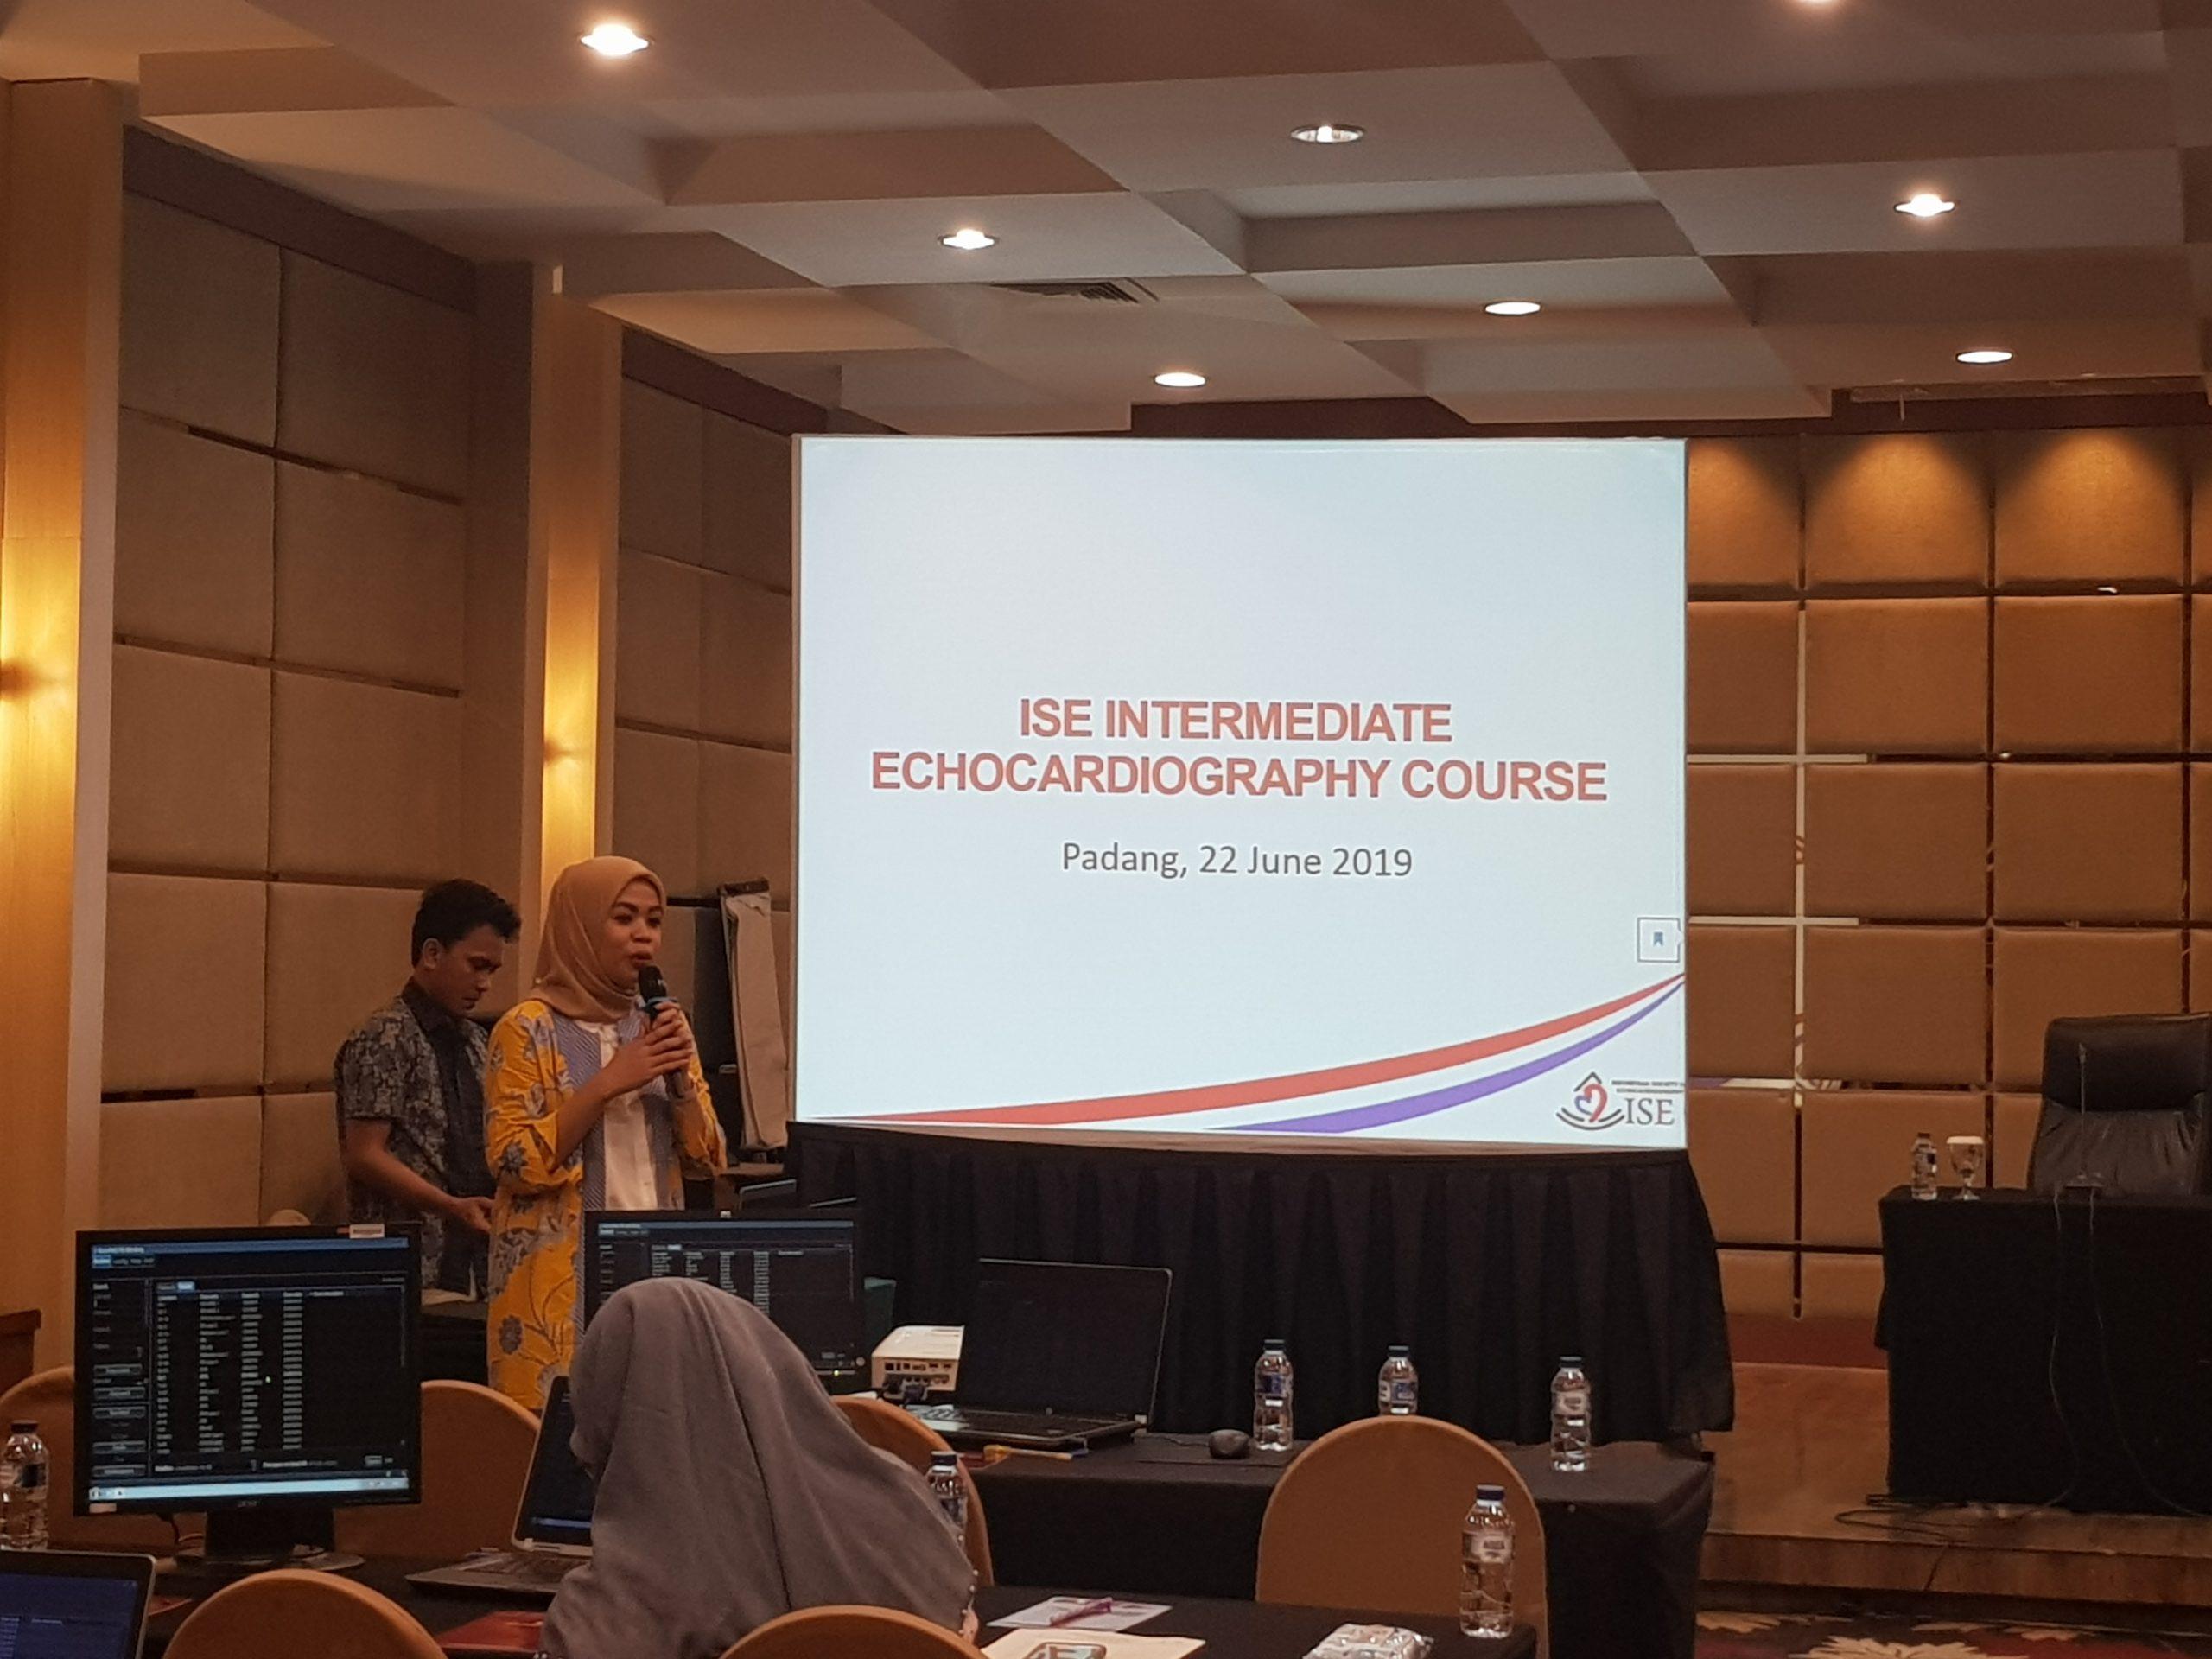 ISE Intermediate Echocardiography Course